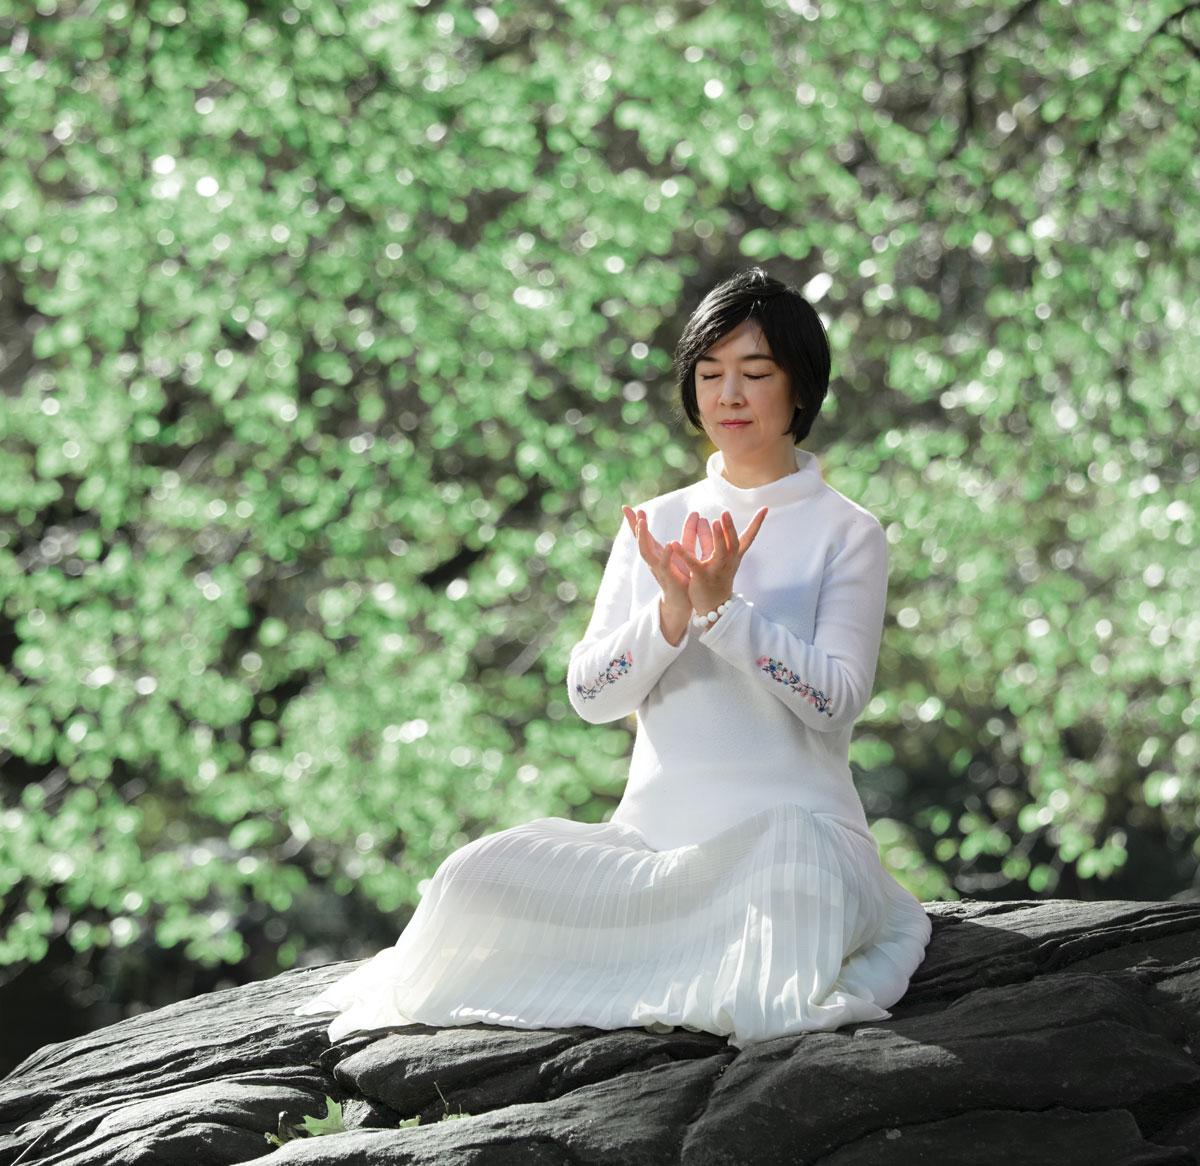 Jennifer Zeng practicing Falun Gong meditation